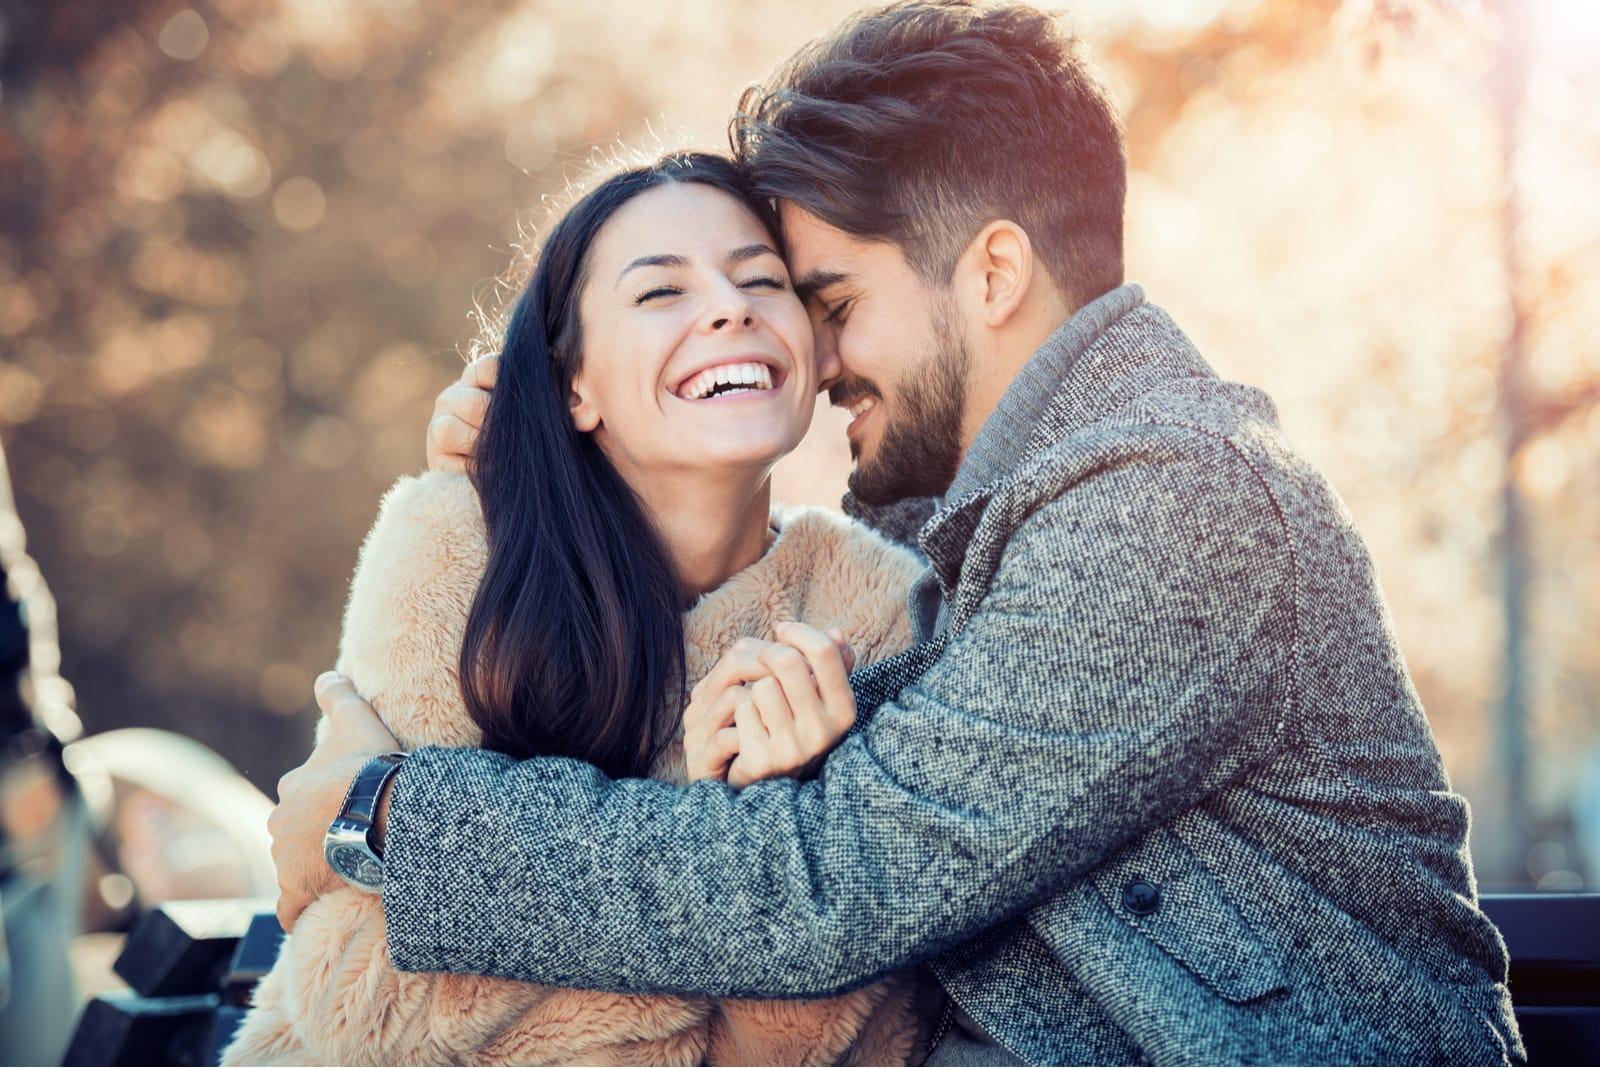 young man hugging tight smiling woman